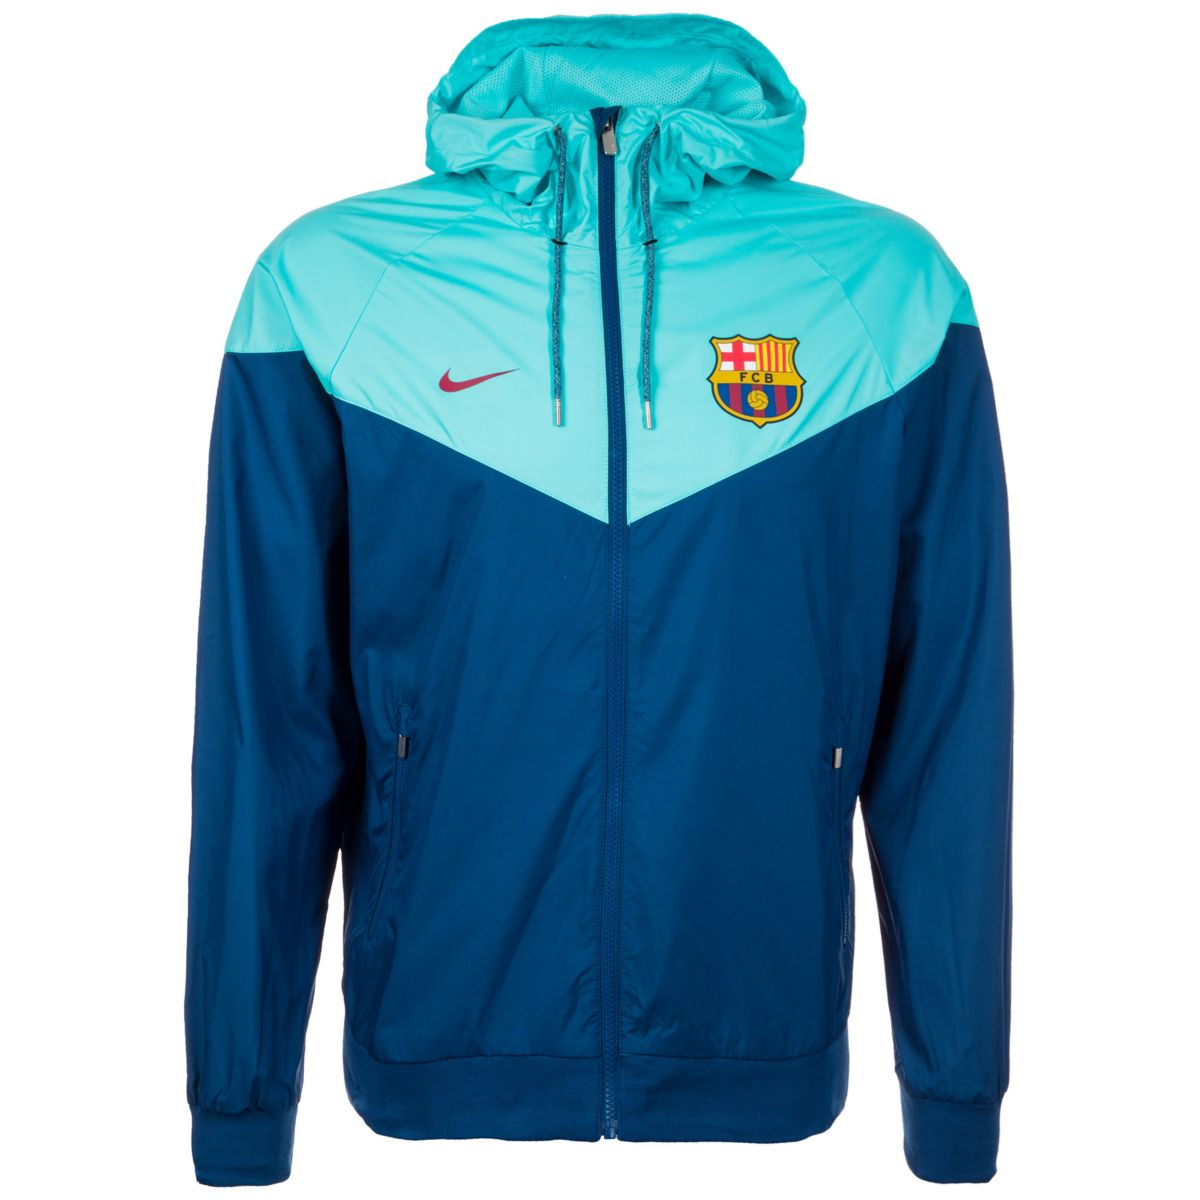 Nike Kapuzenjacke »Fc Barcelona Windrunner«